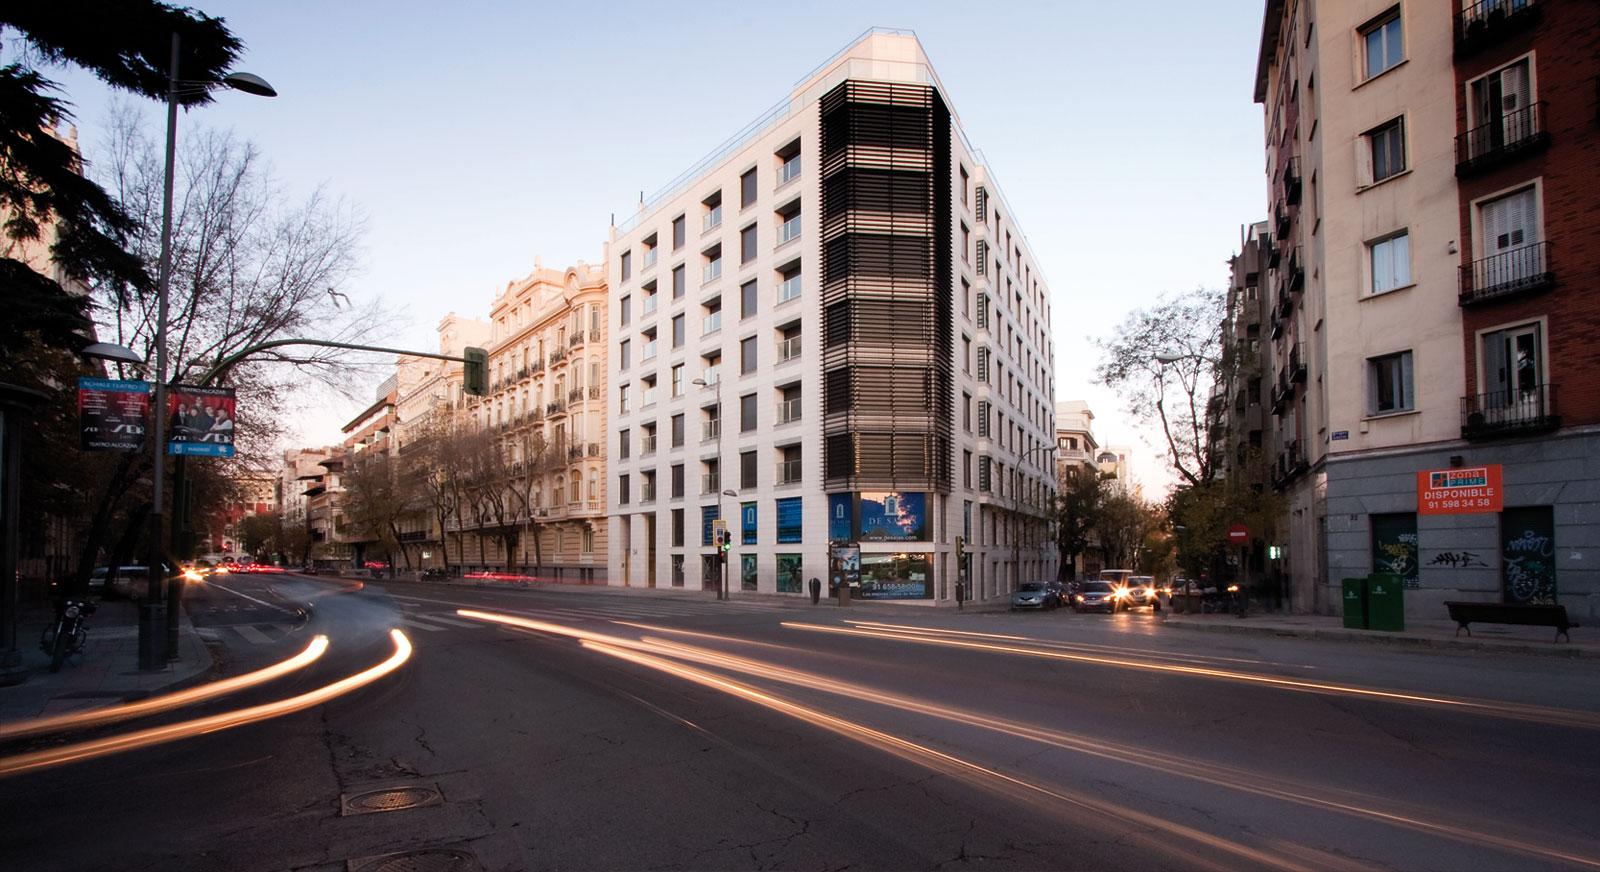 Projects almagro 34 allende arquitectos - Arquitectos madrid ...